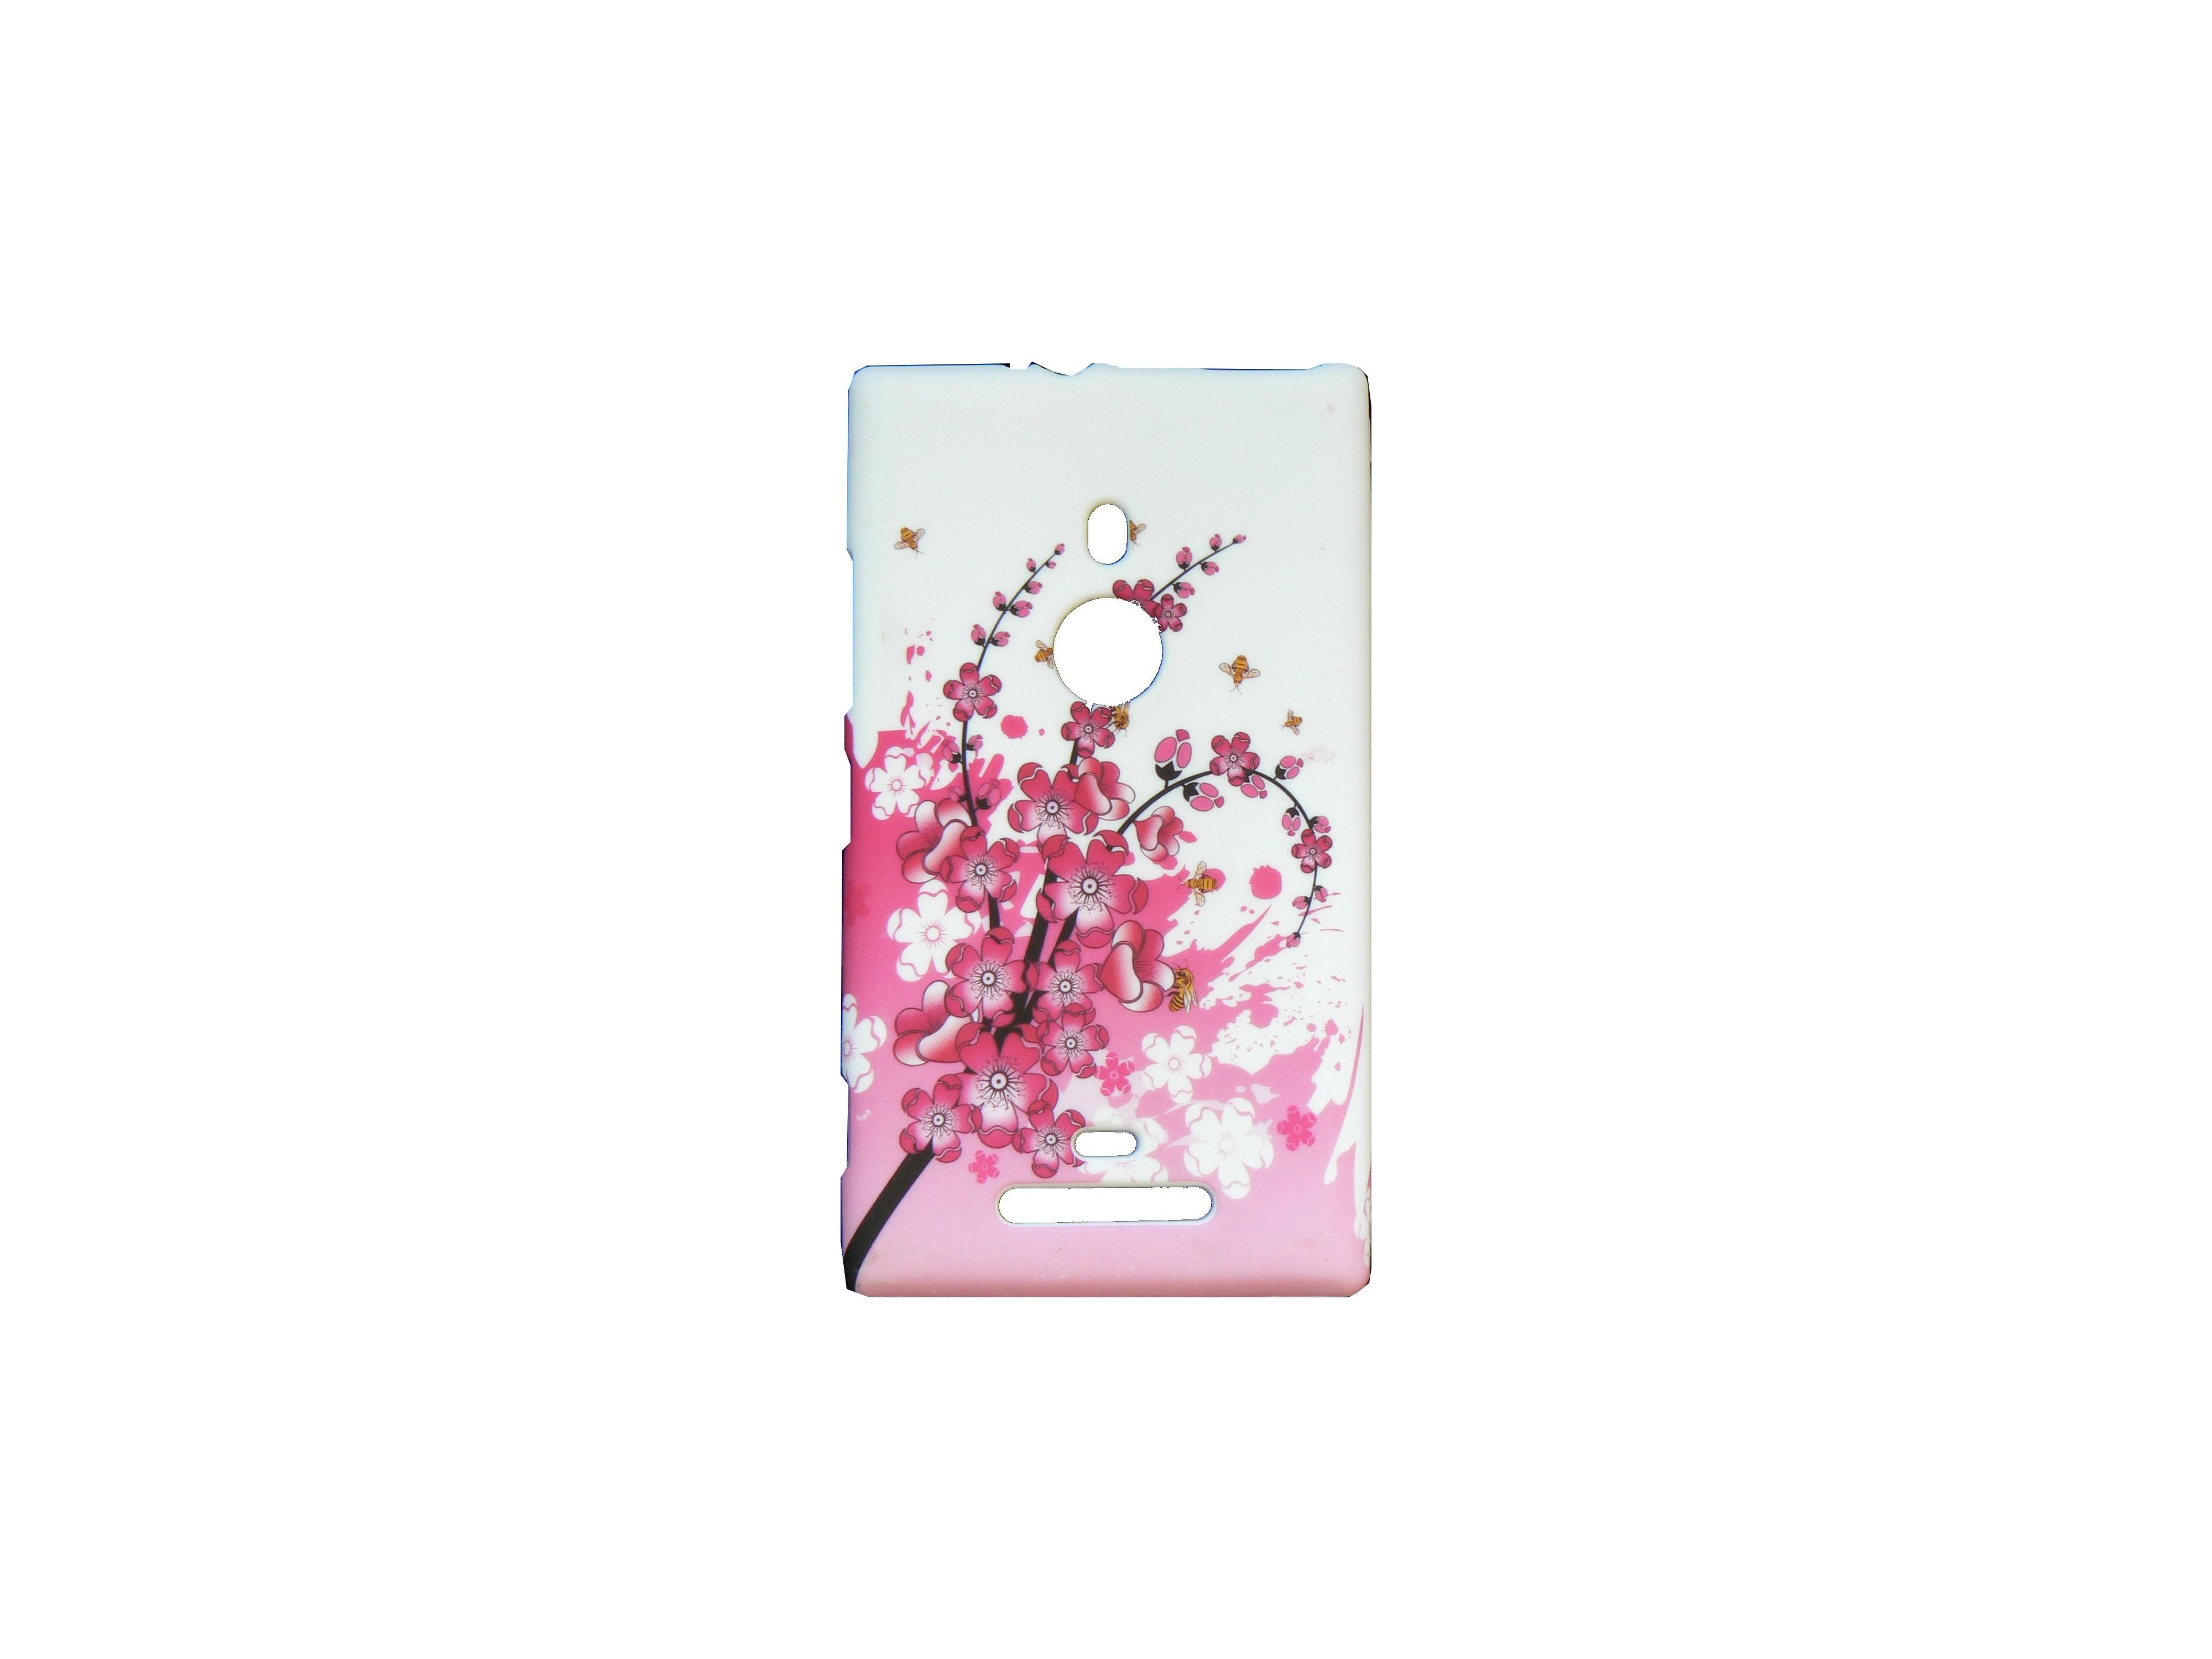 coque pour nokia lumia 925 petites fleurs roses